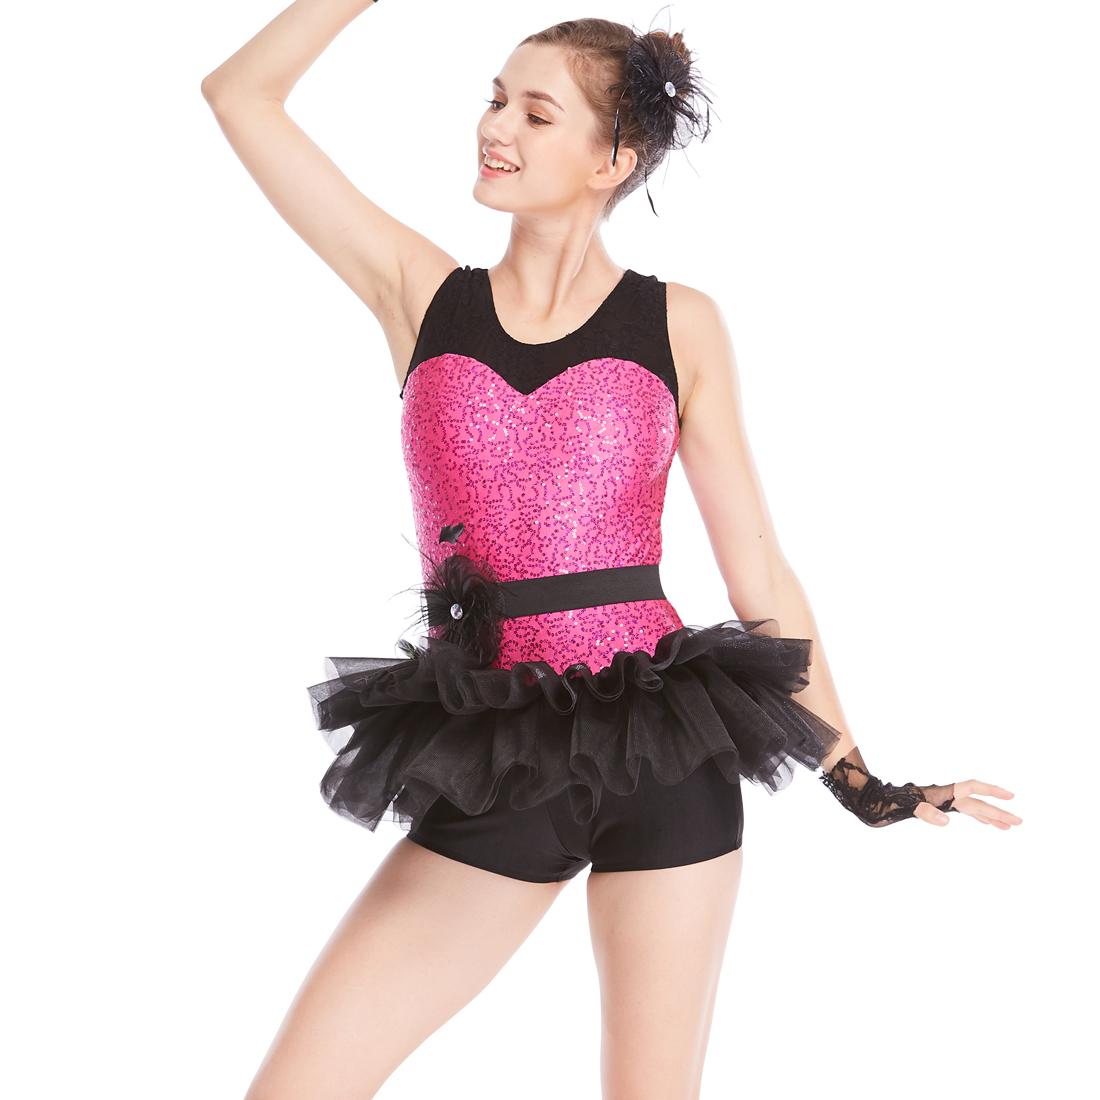 MIDEE durable dance costume get quote events-1